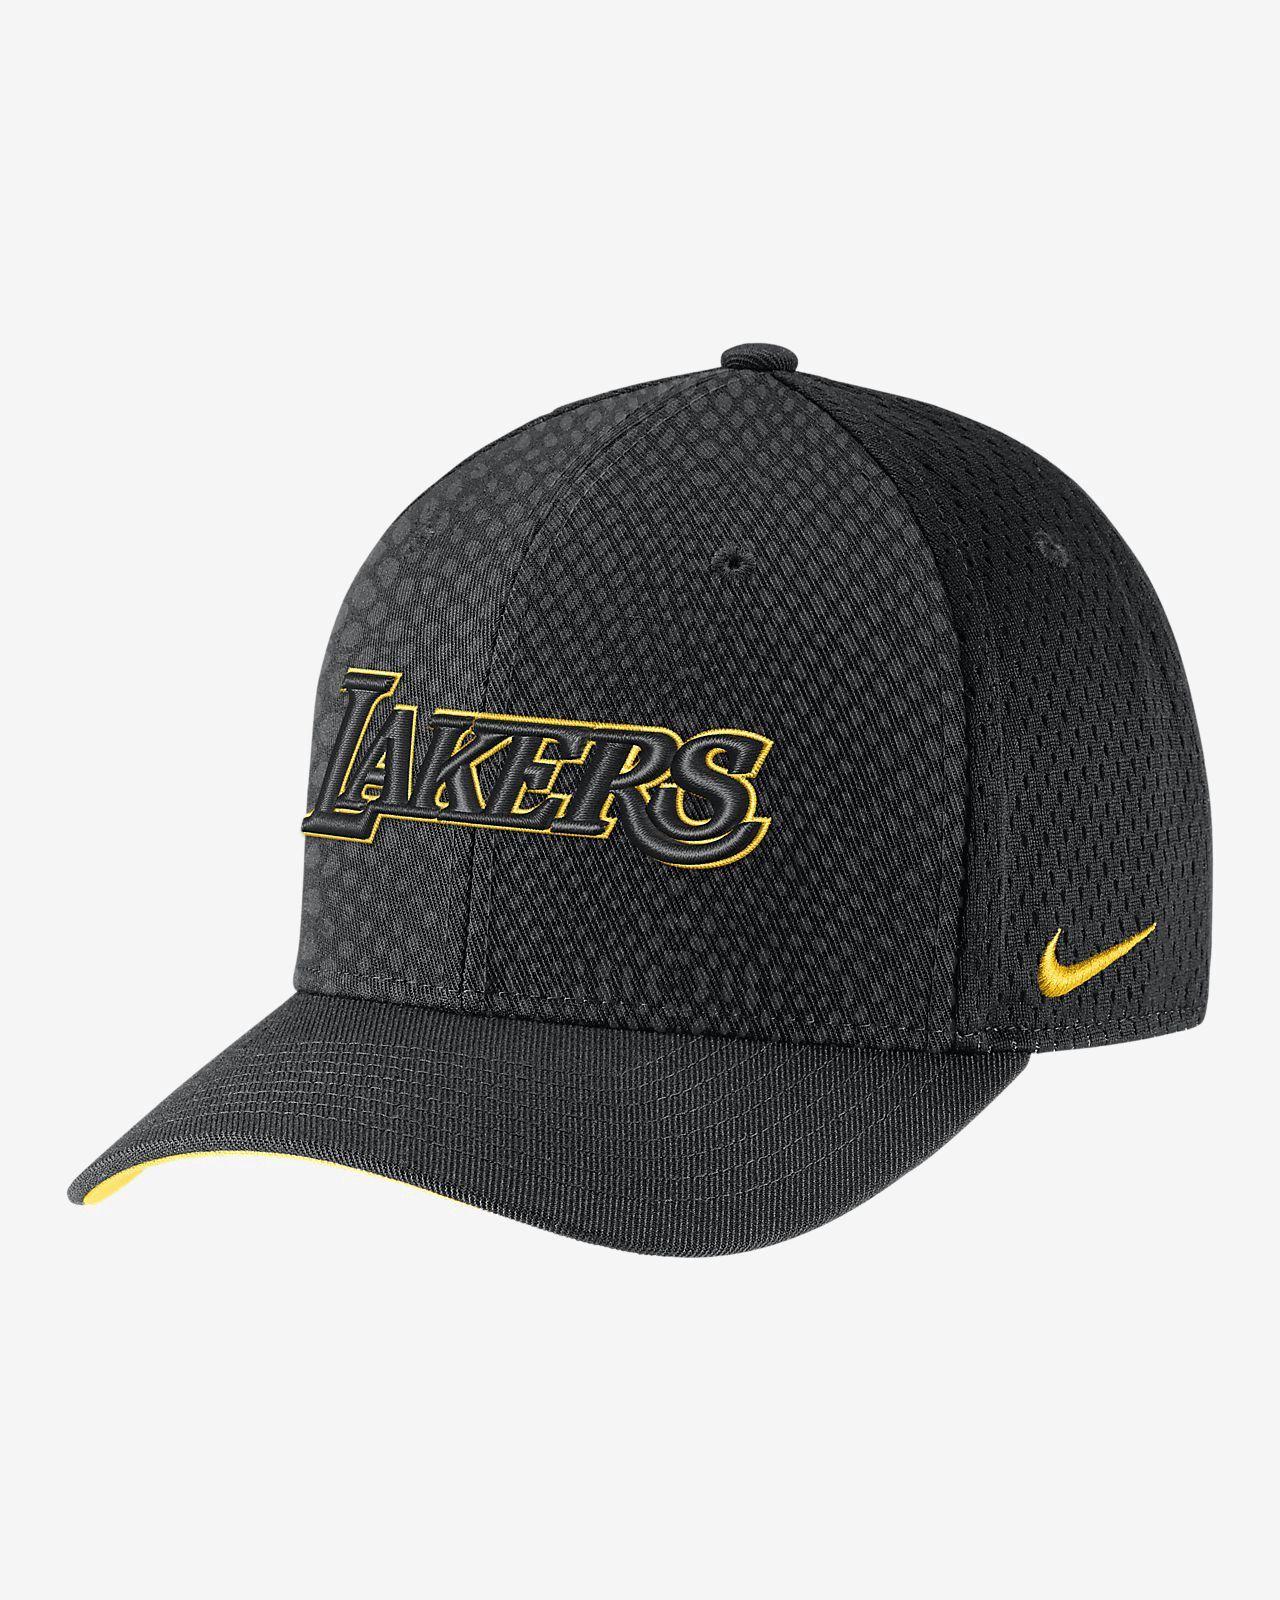 981fa4de85021 Nike Los Angeles Lakers City Edition Classic99 Unisex Nba Hat ...